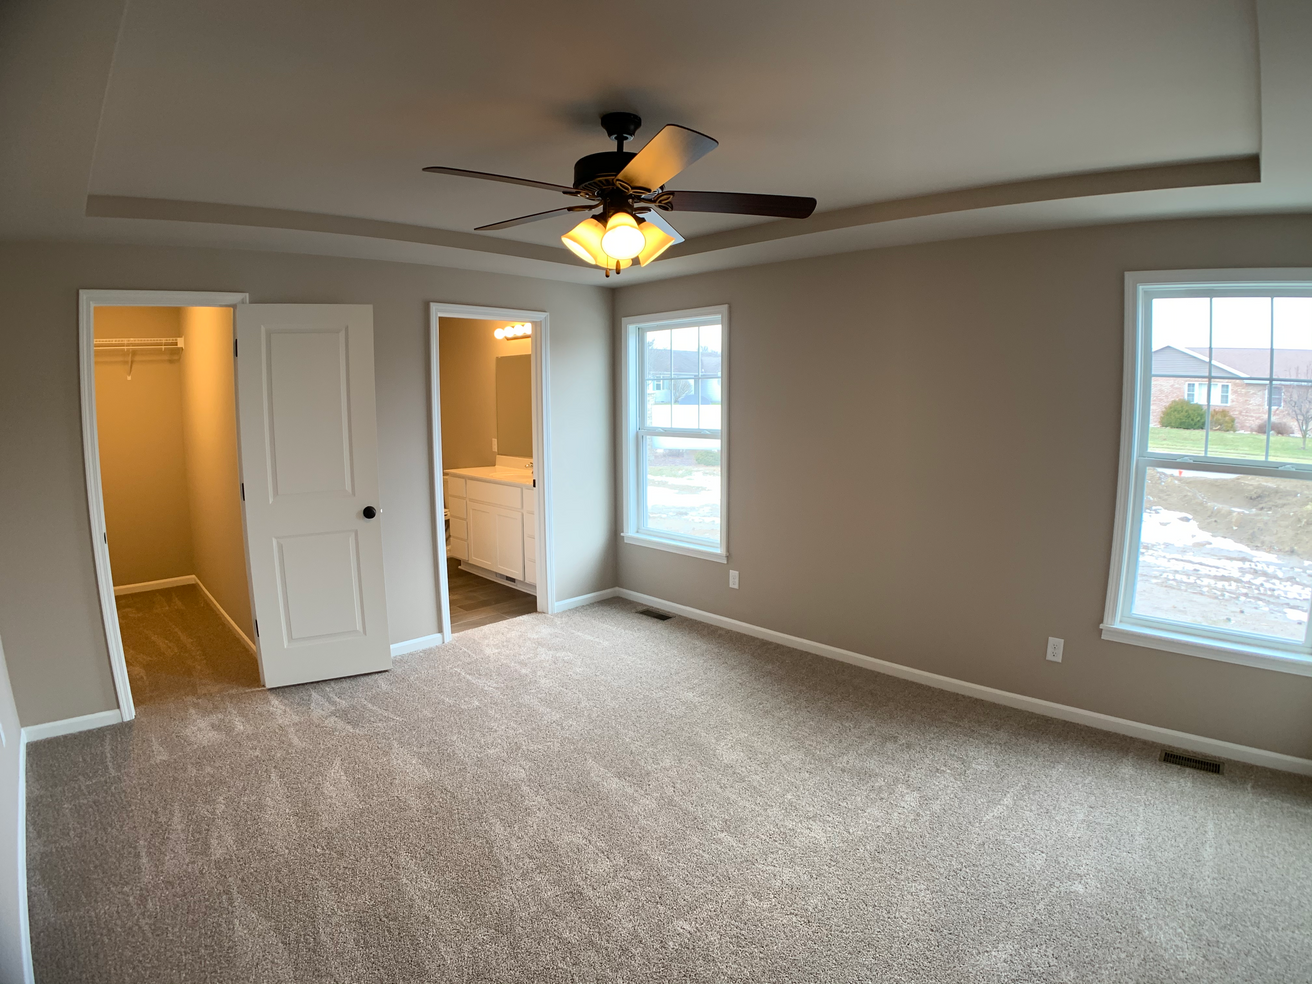 Jefferson Master Bedroom 1